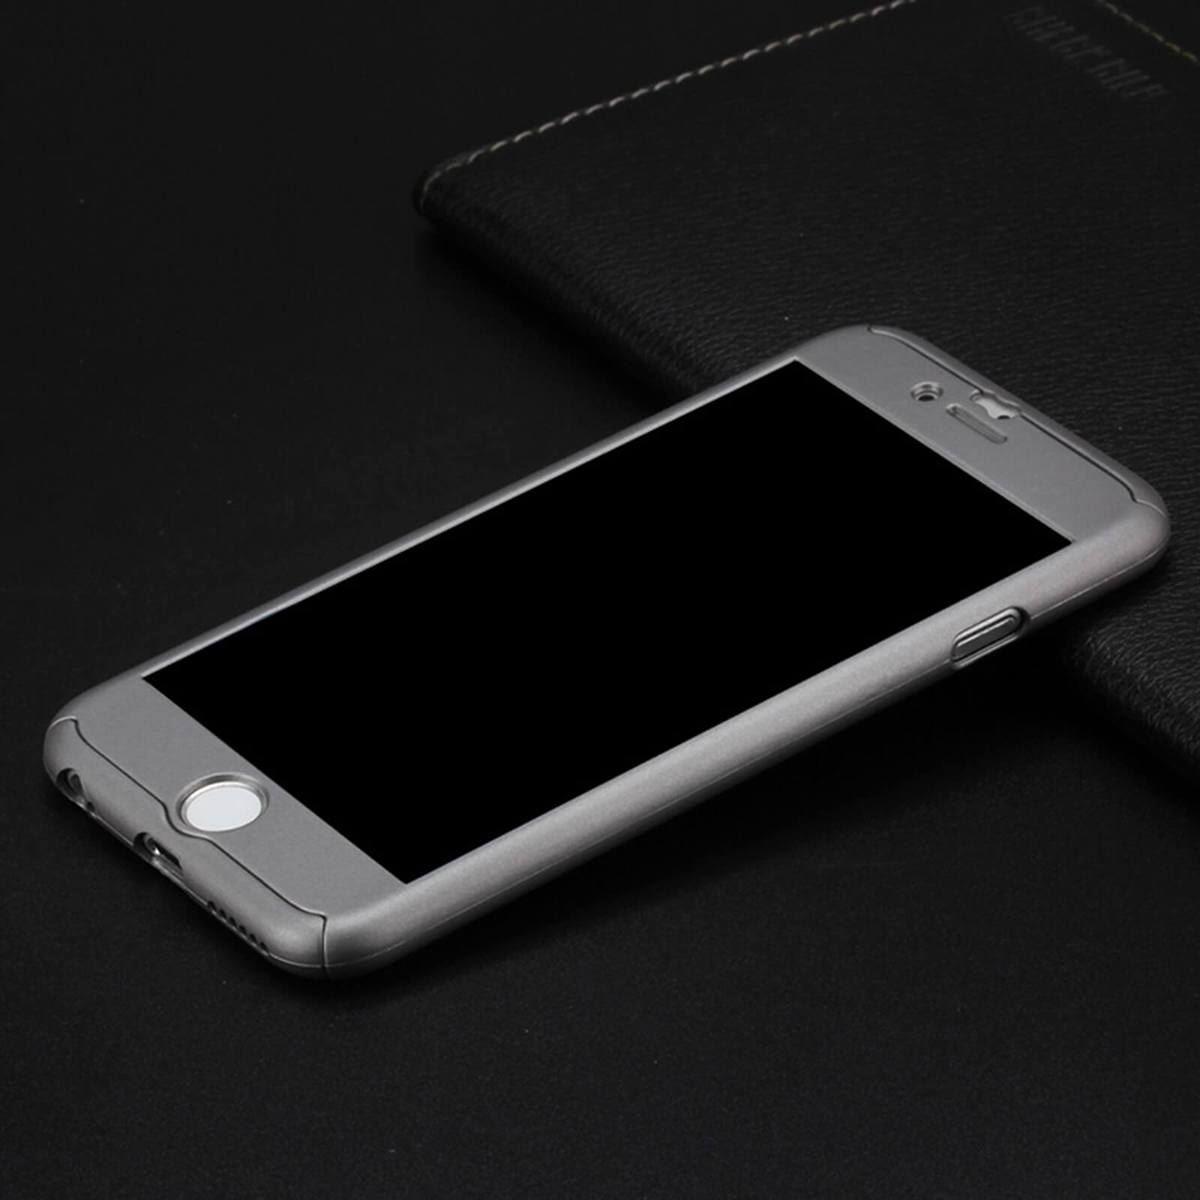 For-Apple-iPhone-XS-Max-XR-Hybrid-360-Slim-Ultra-Thin-Heavy-Duty-Shockproof-Case Indexbild 48